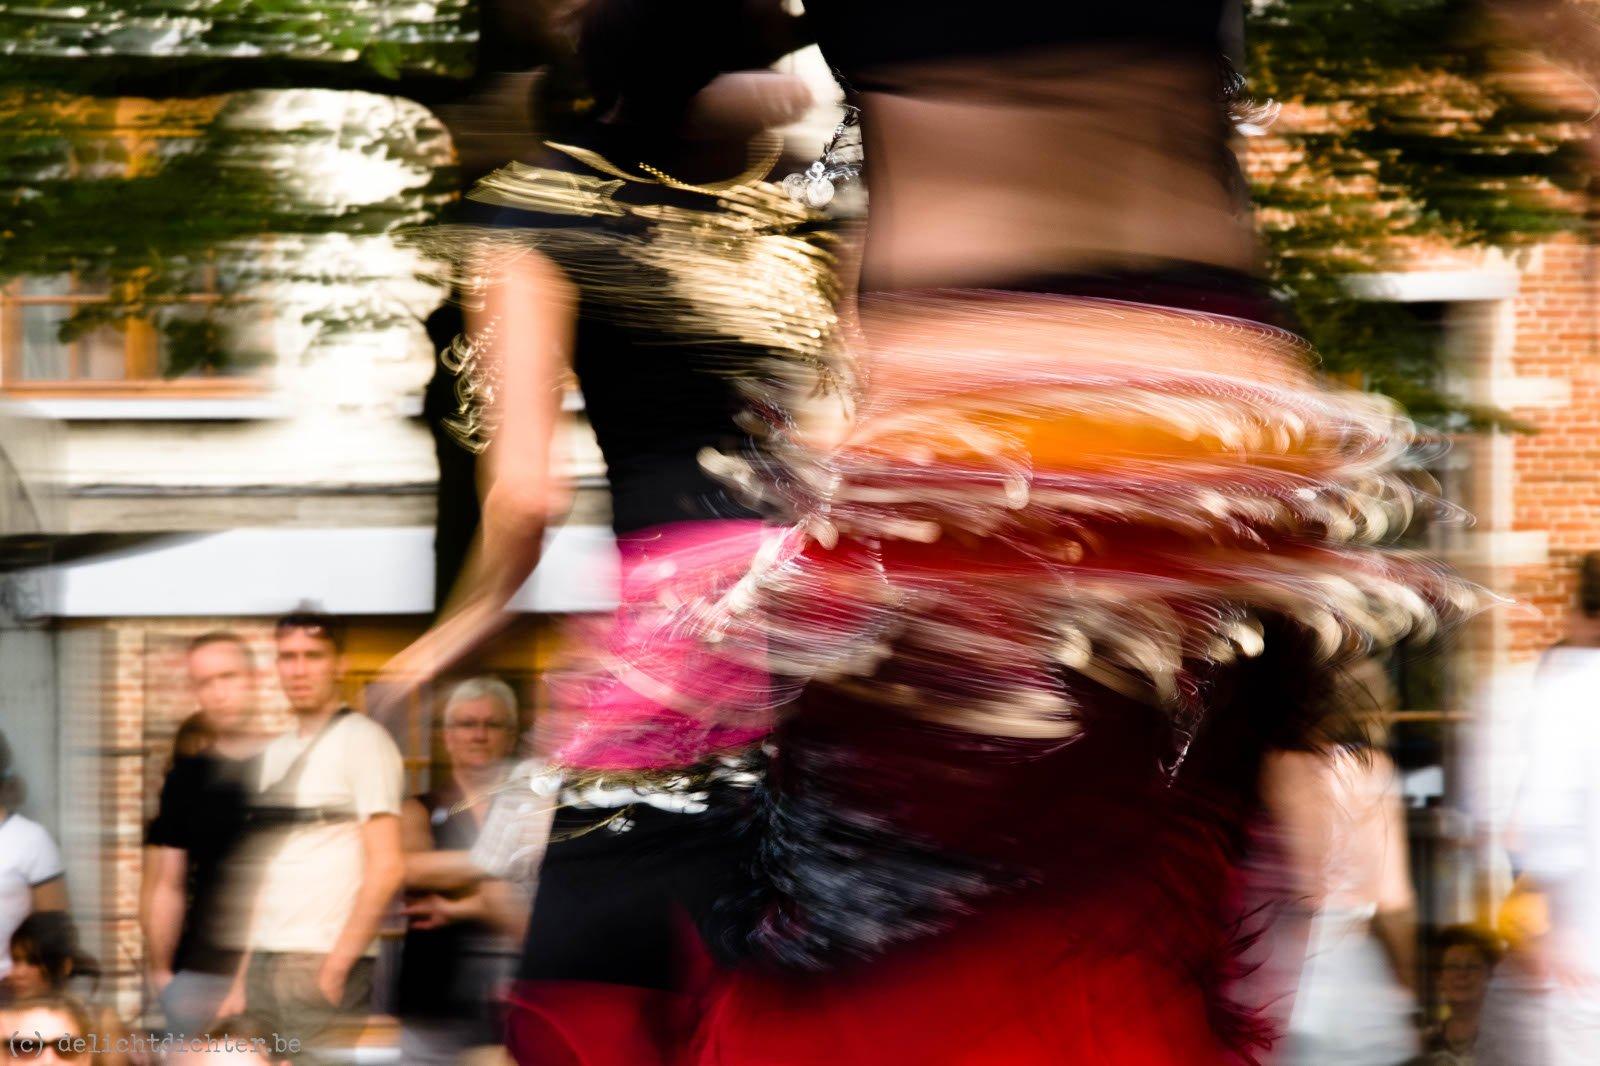 2008_08_cultuurmarkt_20080831_154307